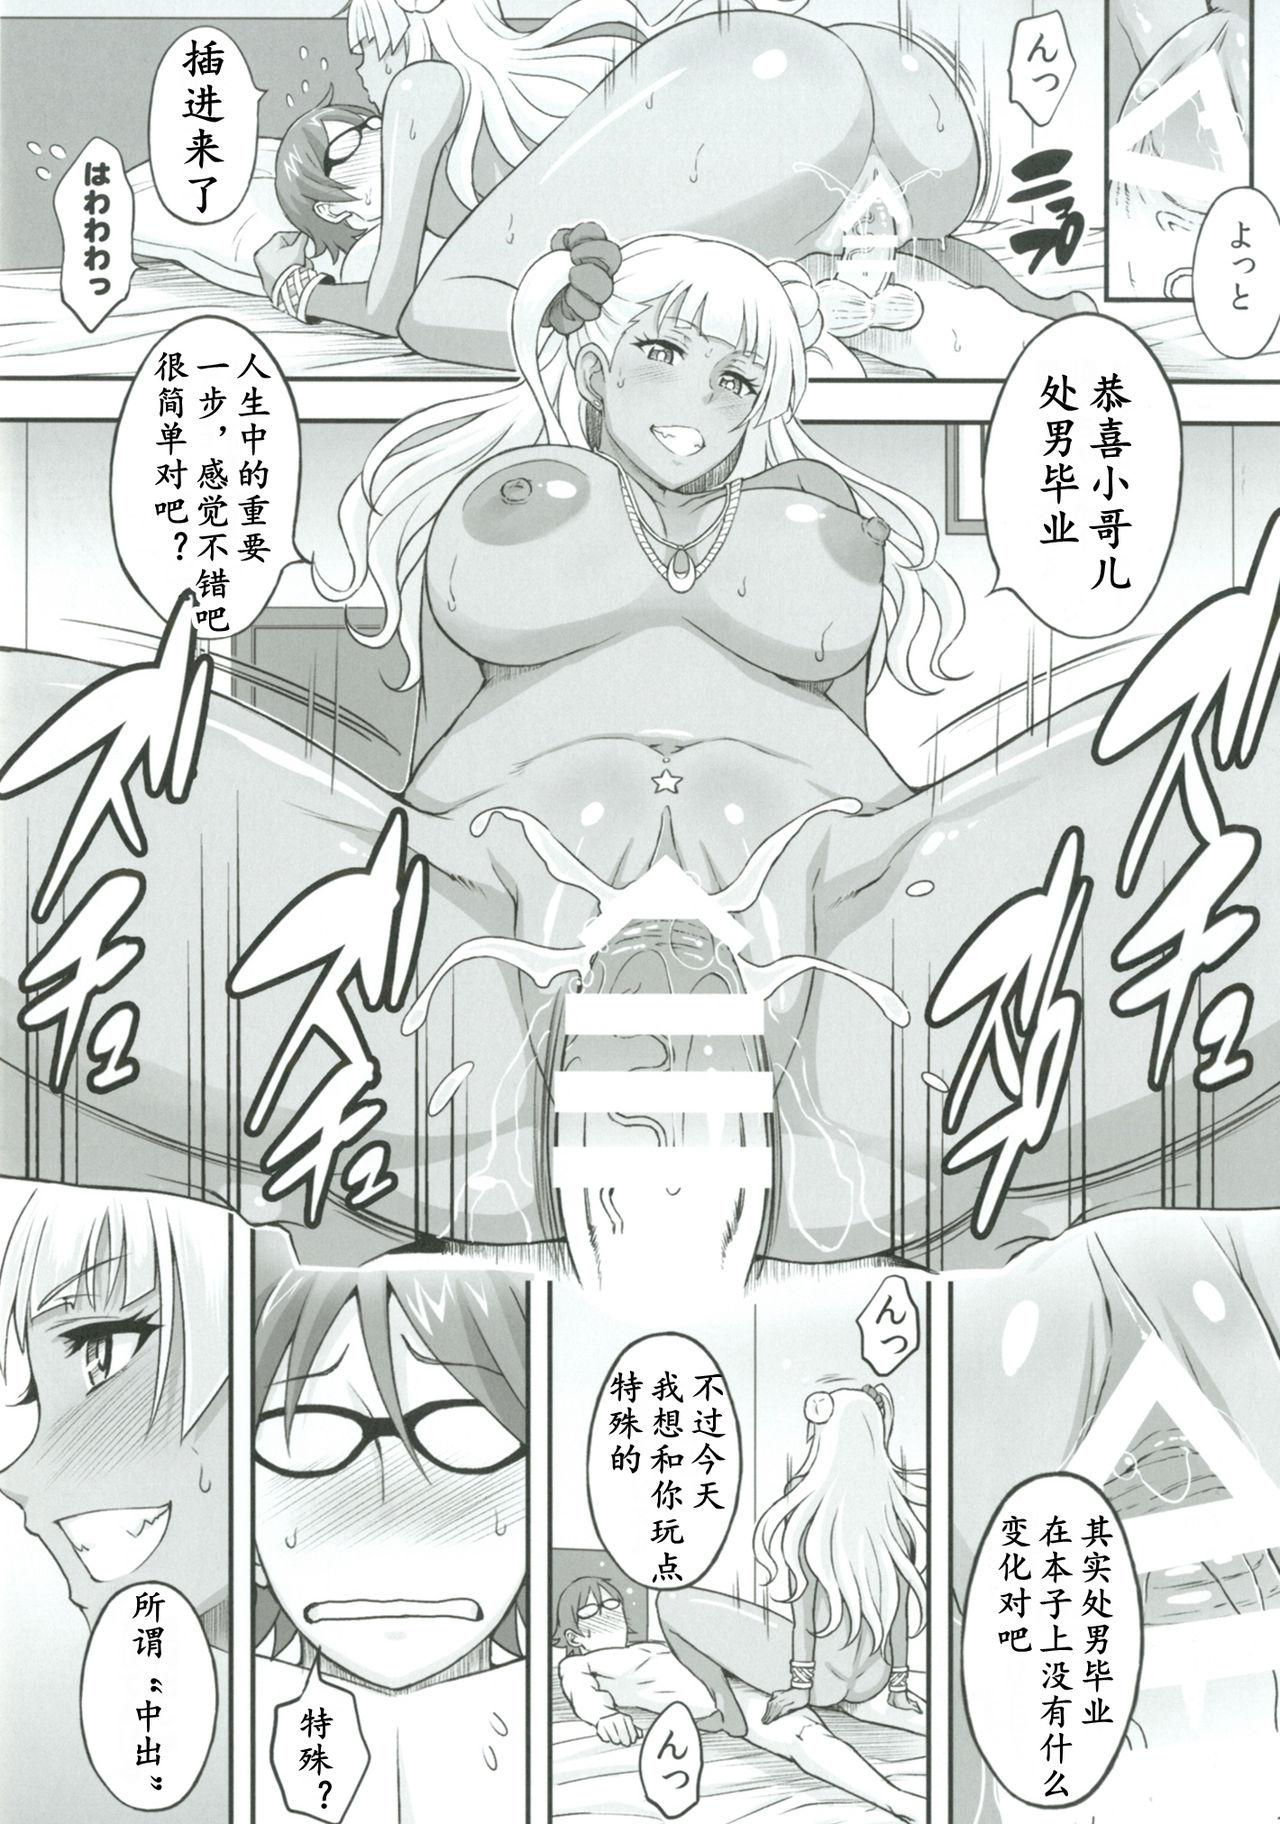 Omakase Fudeoroshi Galko-chan 2 | 拜托你了!辣妹子2 8